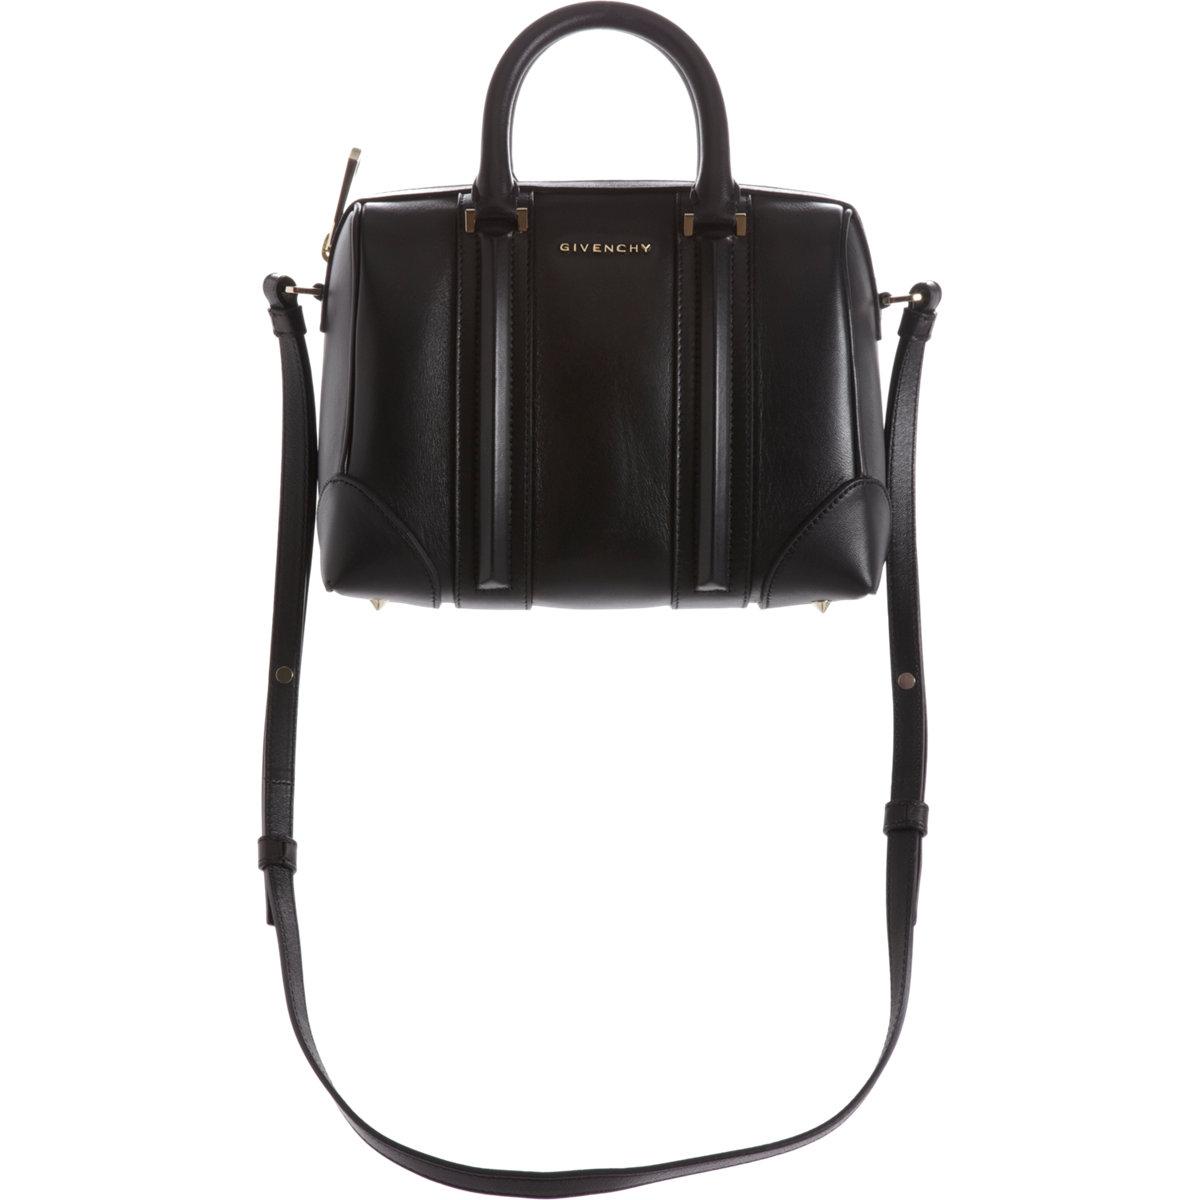 118d45aaafc Givenchy Mini Lucrezia Duffel in Black - Lyst